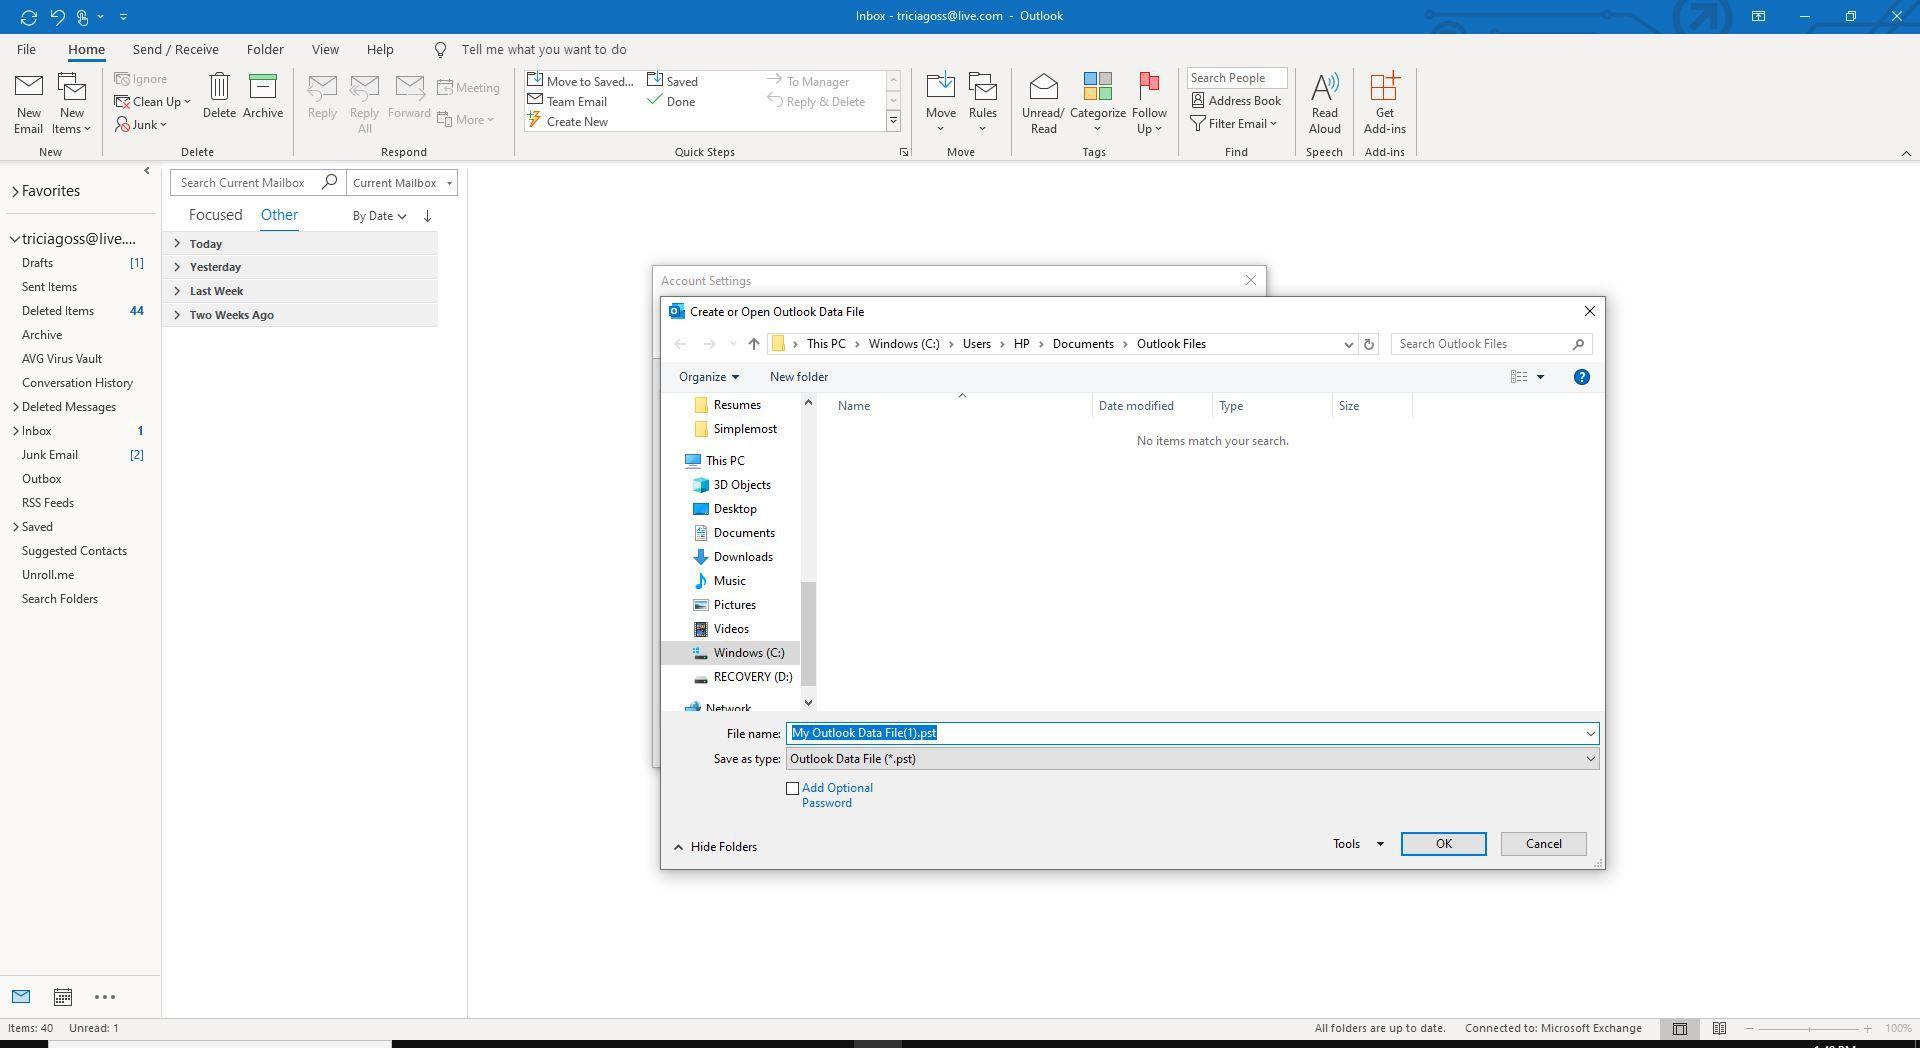 Screenshot of Create or Open Outlook Data File